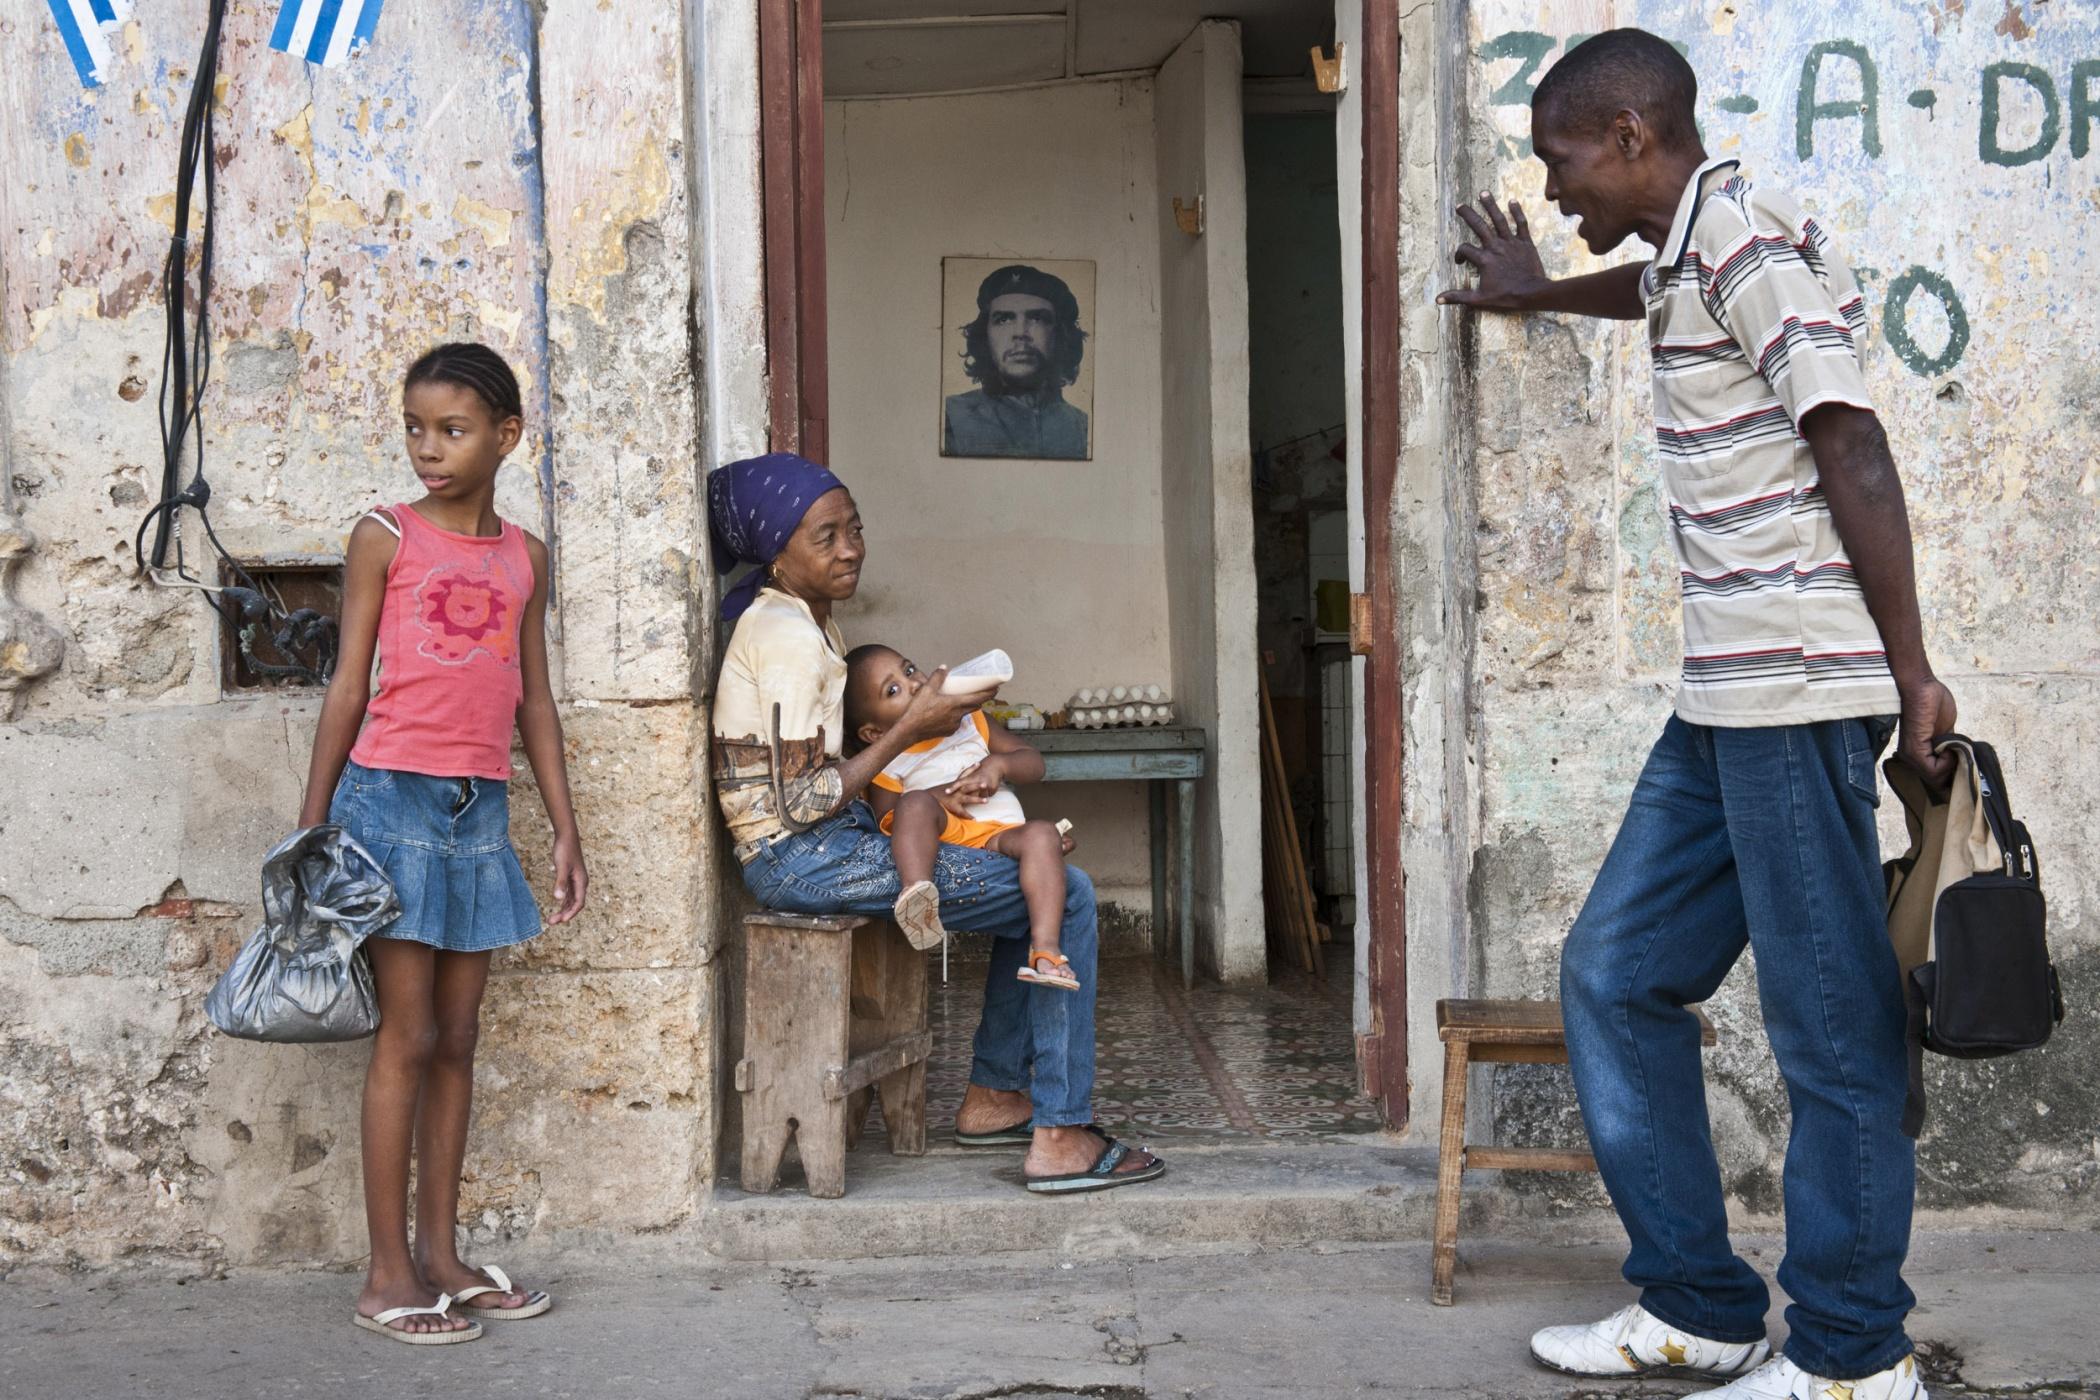 Habana 02 - Prints 2. Ethnoland - Hector Garrido, Aerial and human photography